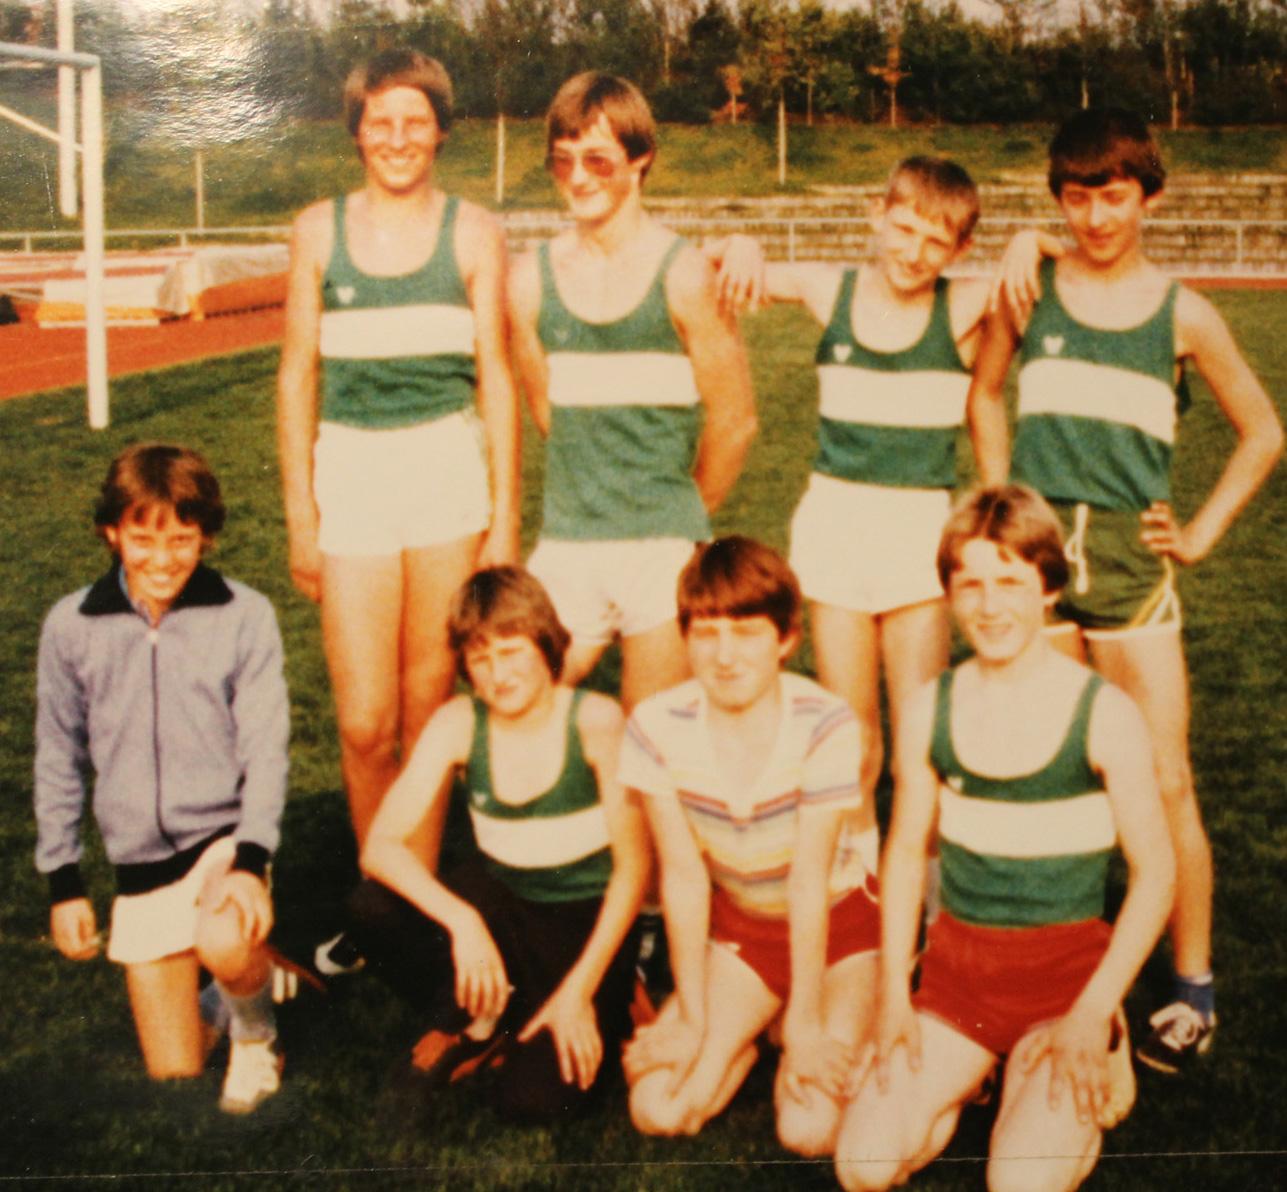 LG Schülergruppe 1983: Hinten vl Christian Wehowsky, Jürgen Link, Christian Eberhardt, Thomas Gaipl. Vorne vl Christian Steiner, Karlo Krebs, Reinhard Kitzinger, Thomas Turnhuber.